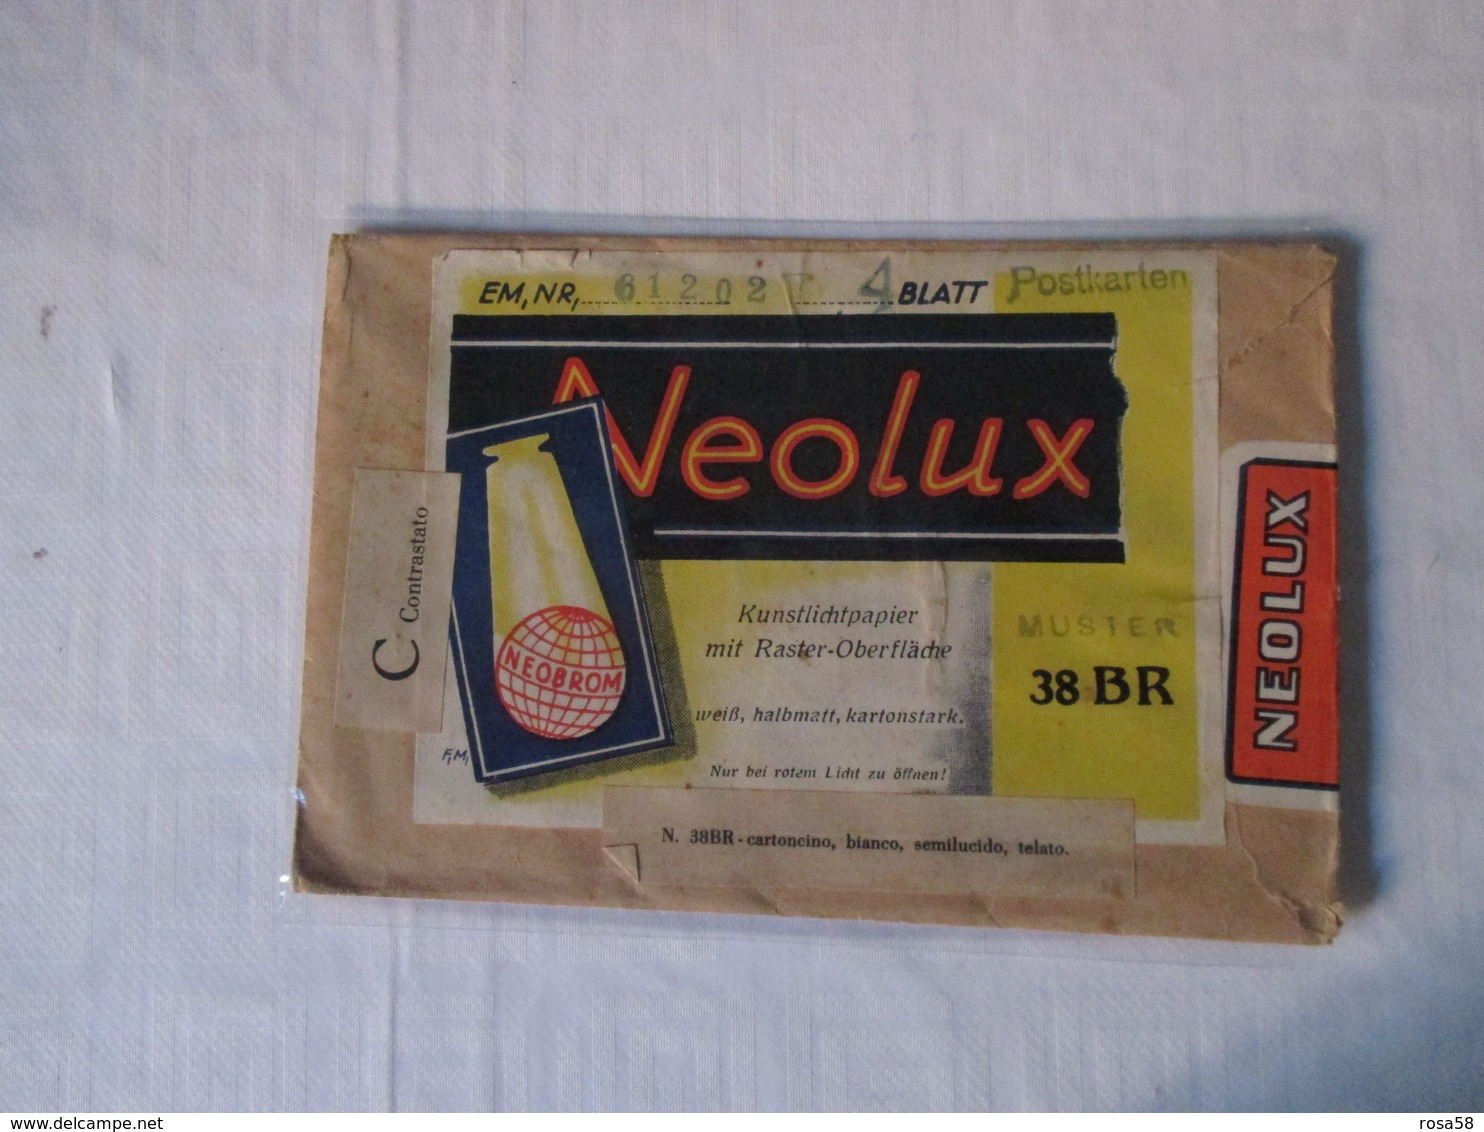 NEOLUX Kunstllichpapier Raster  Neobrom Busta Cartoncino Bianco Semilucido Per FOTO - Autres